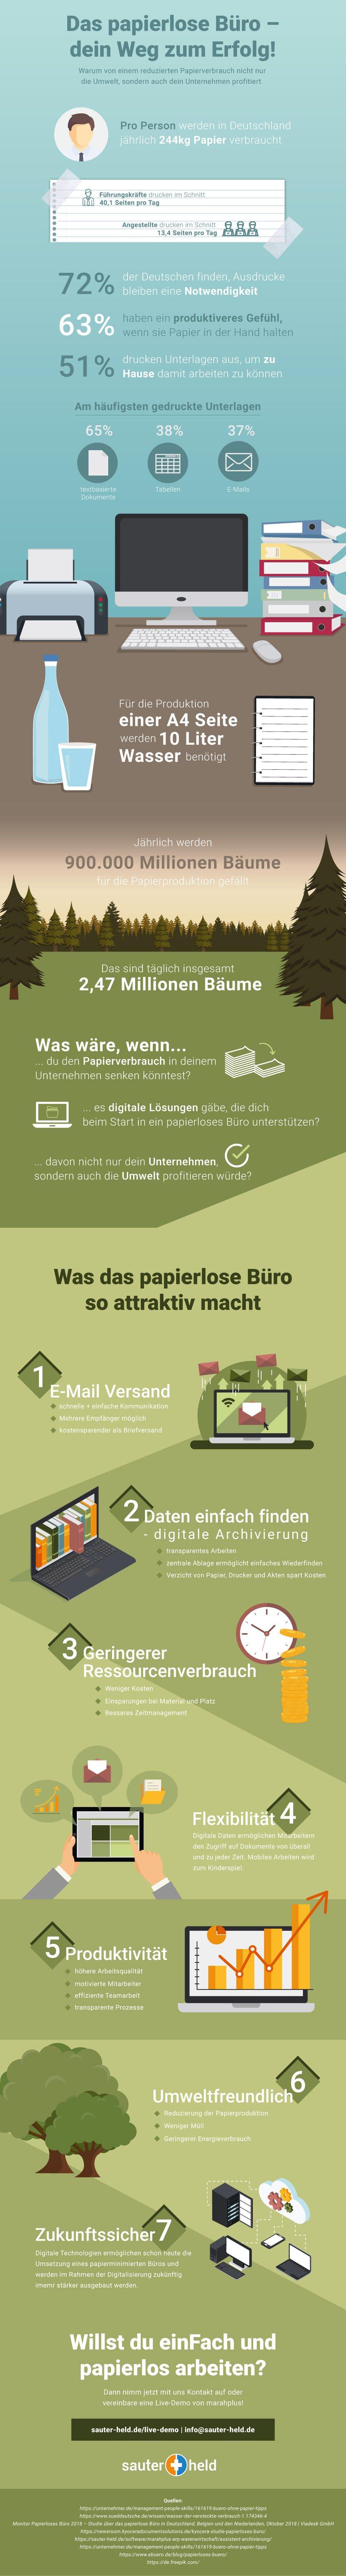 infografik-papierloses-buero-sauterheld-software.jpg